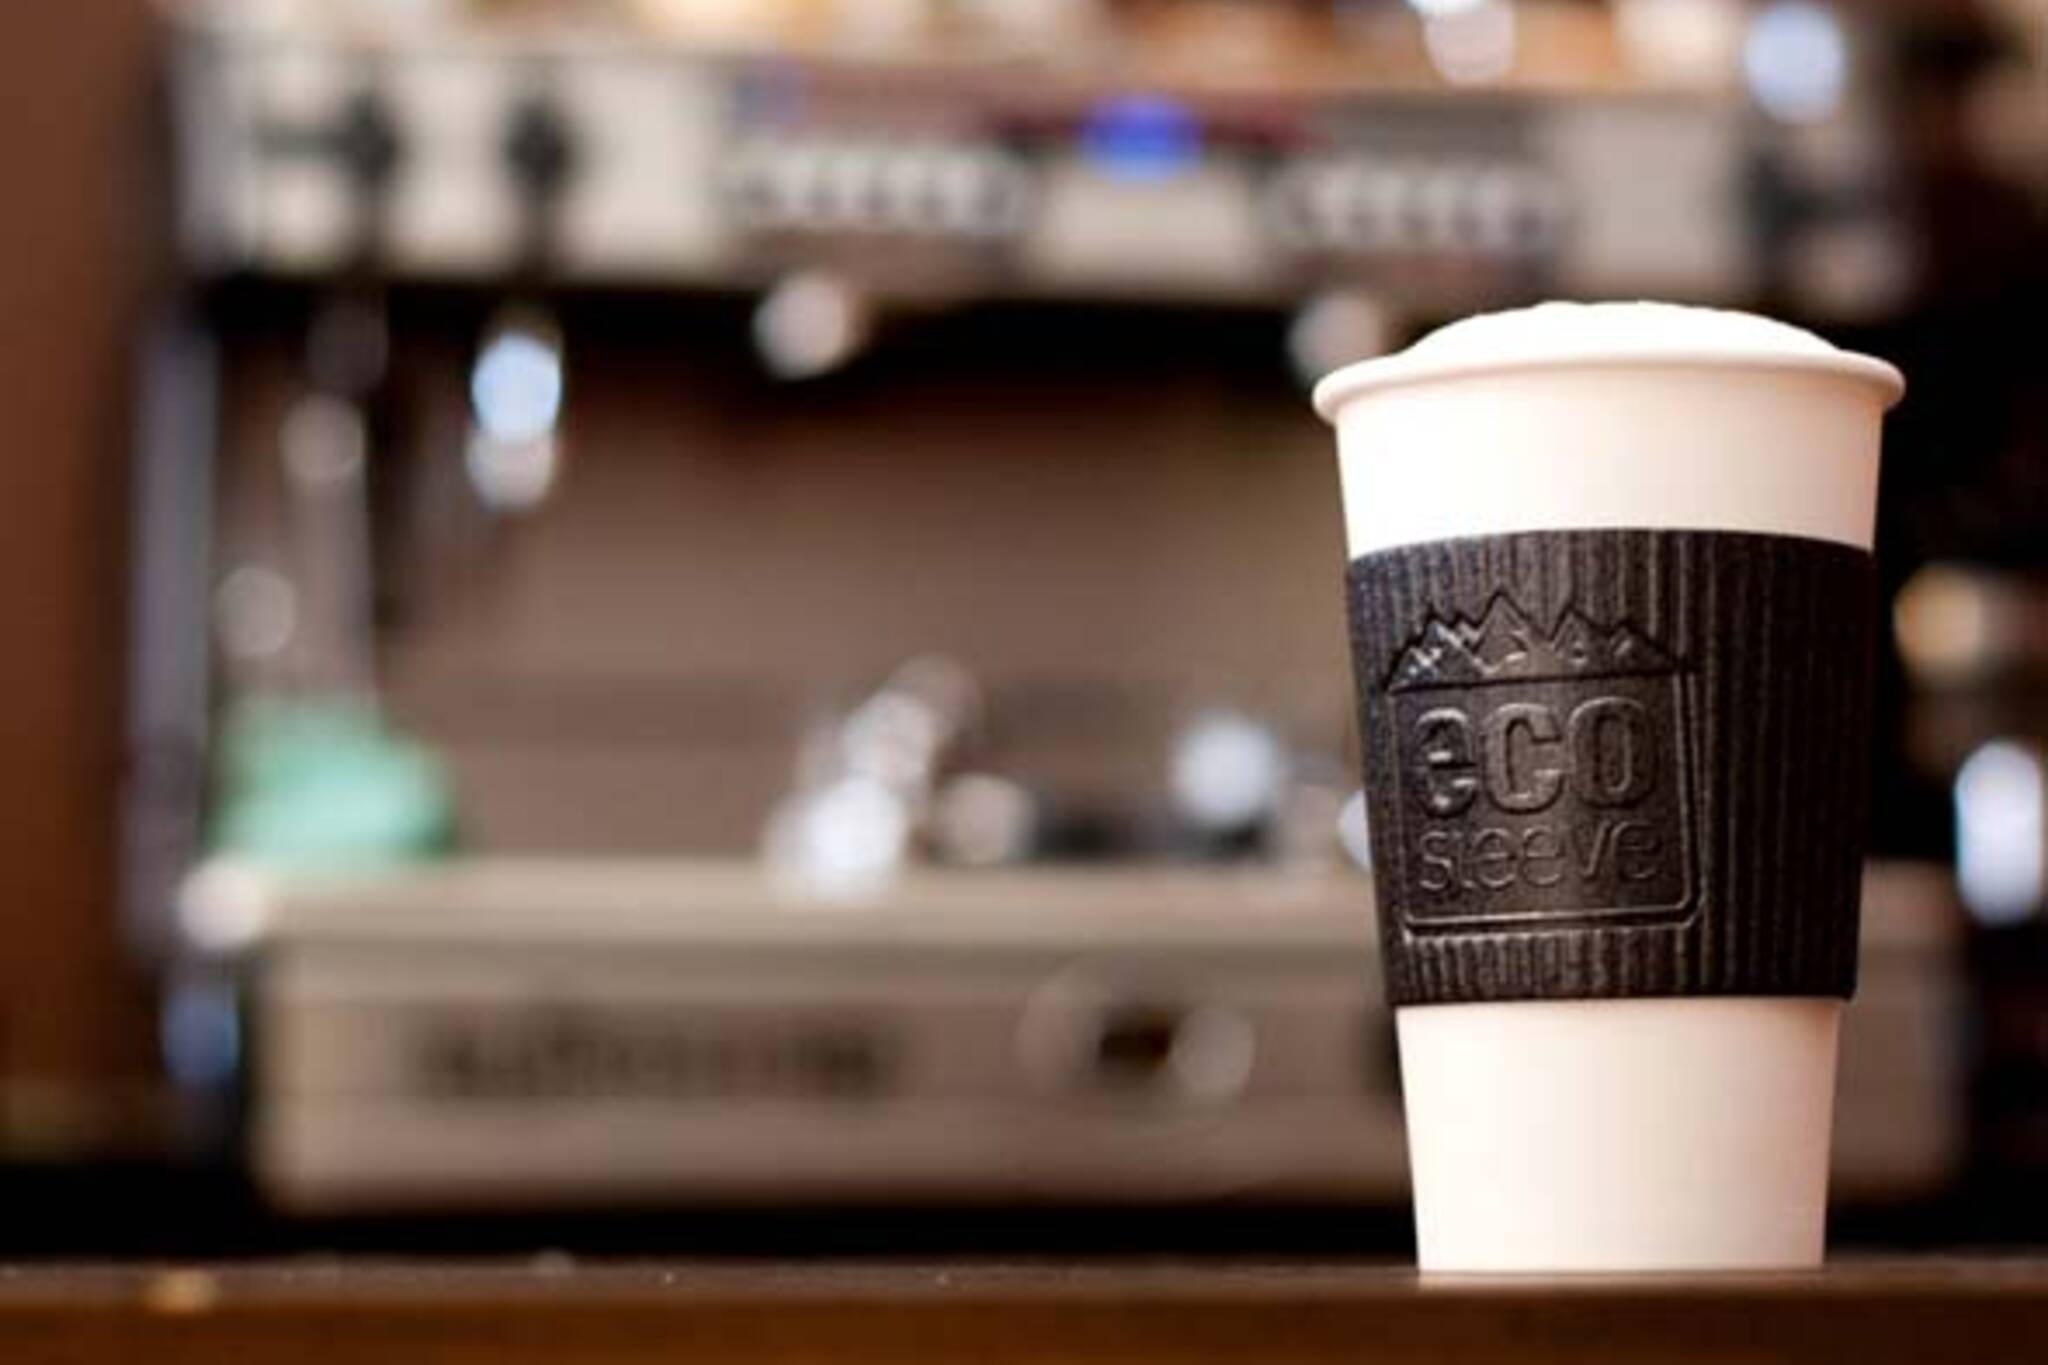 Redline Coffee and Espresso